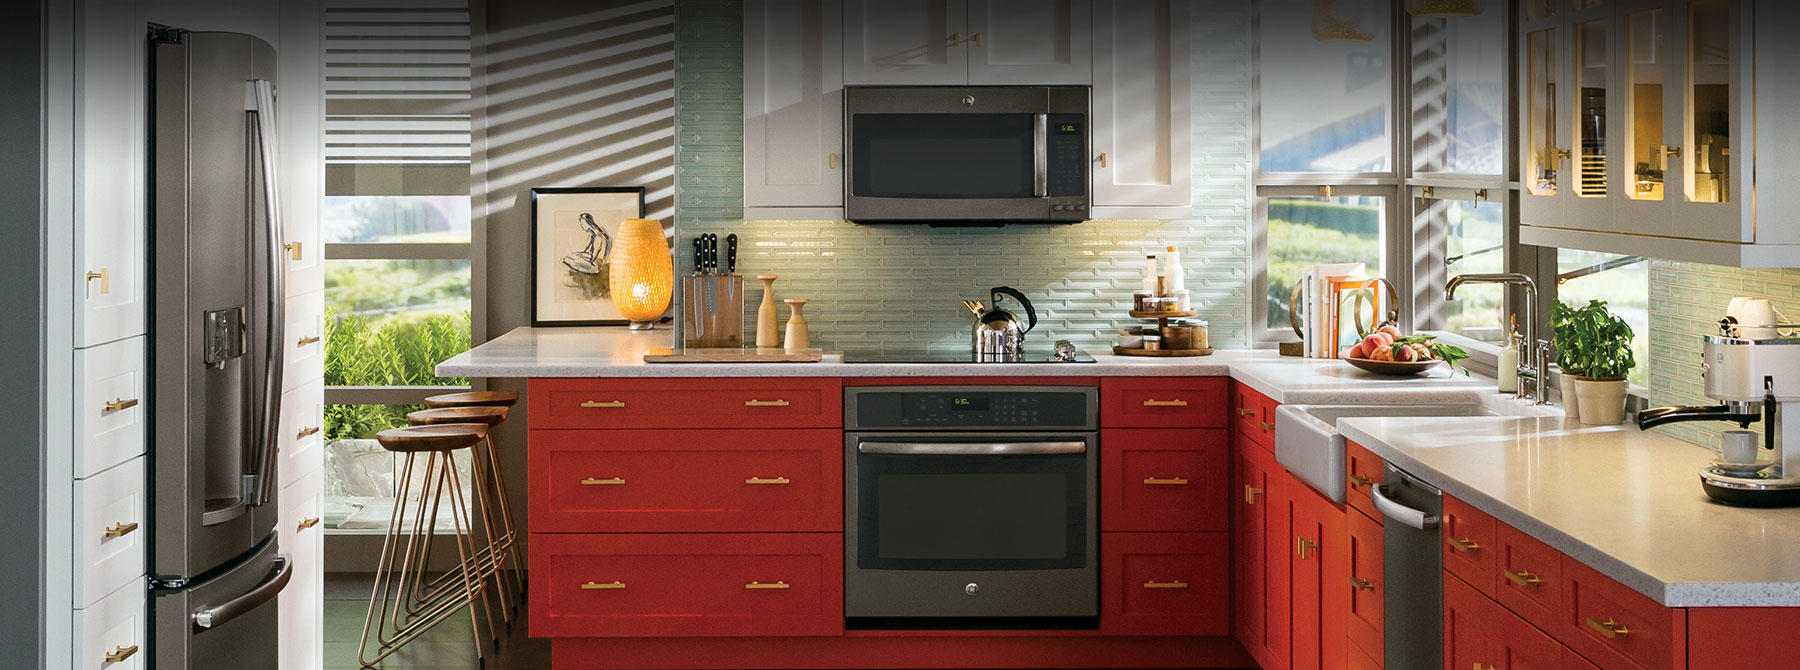 Arizona Discount Appliance image 0